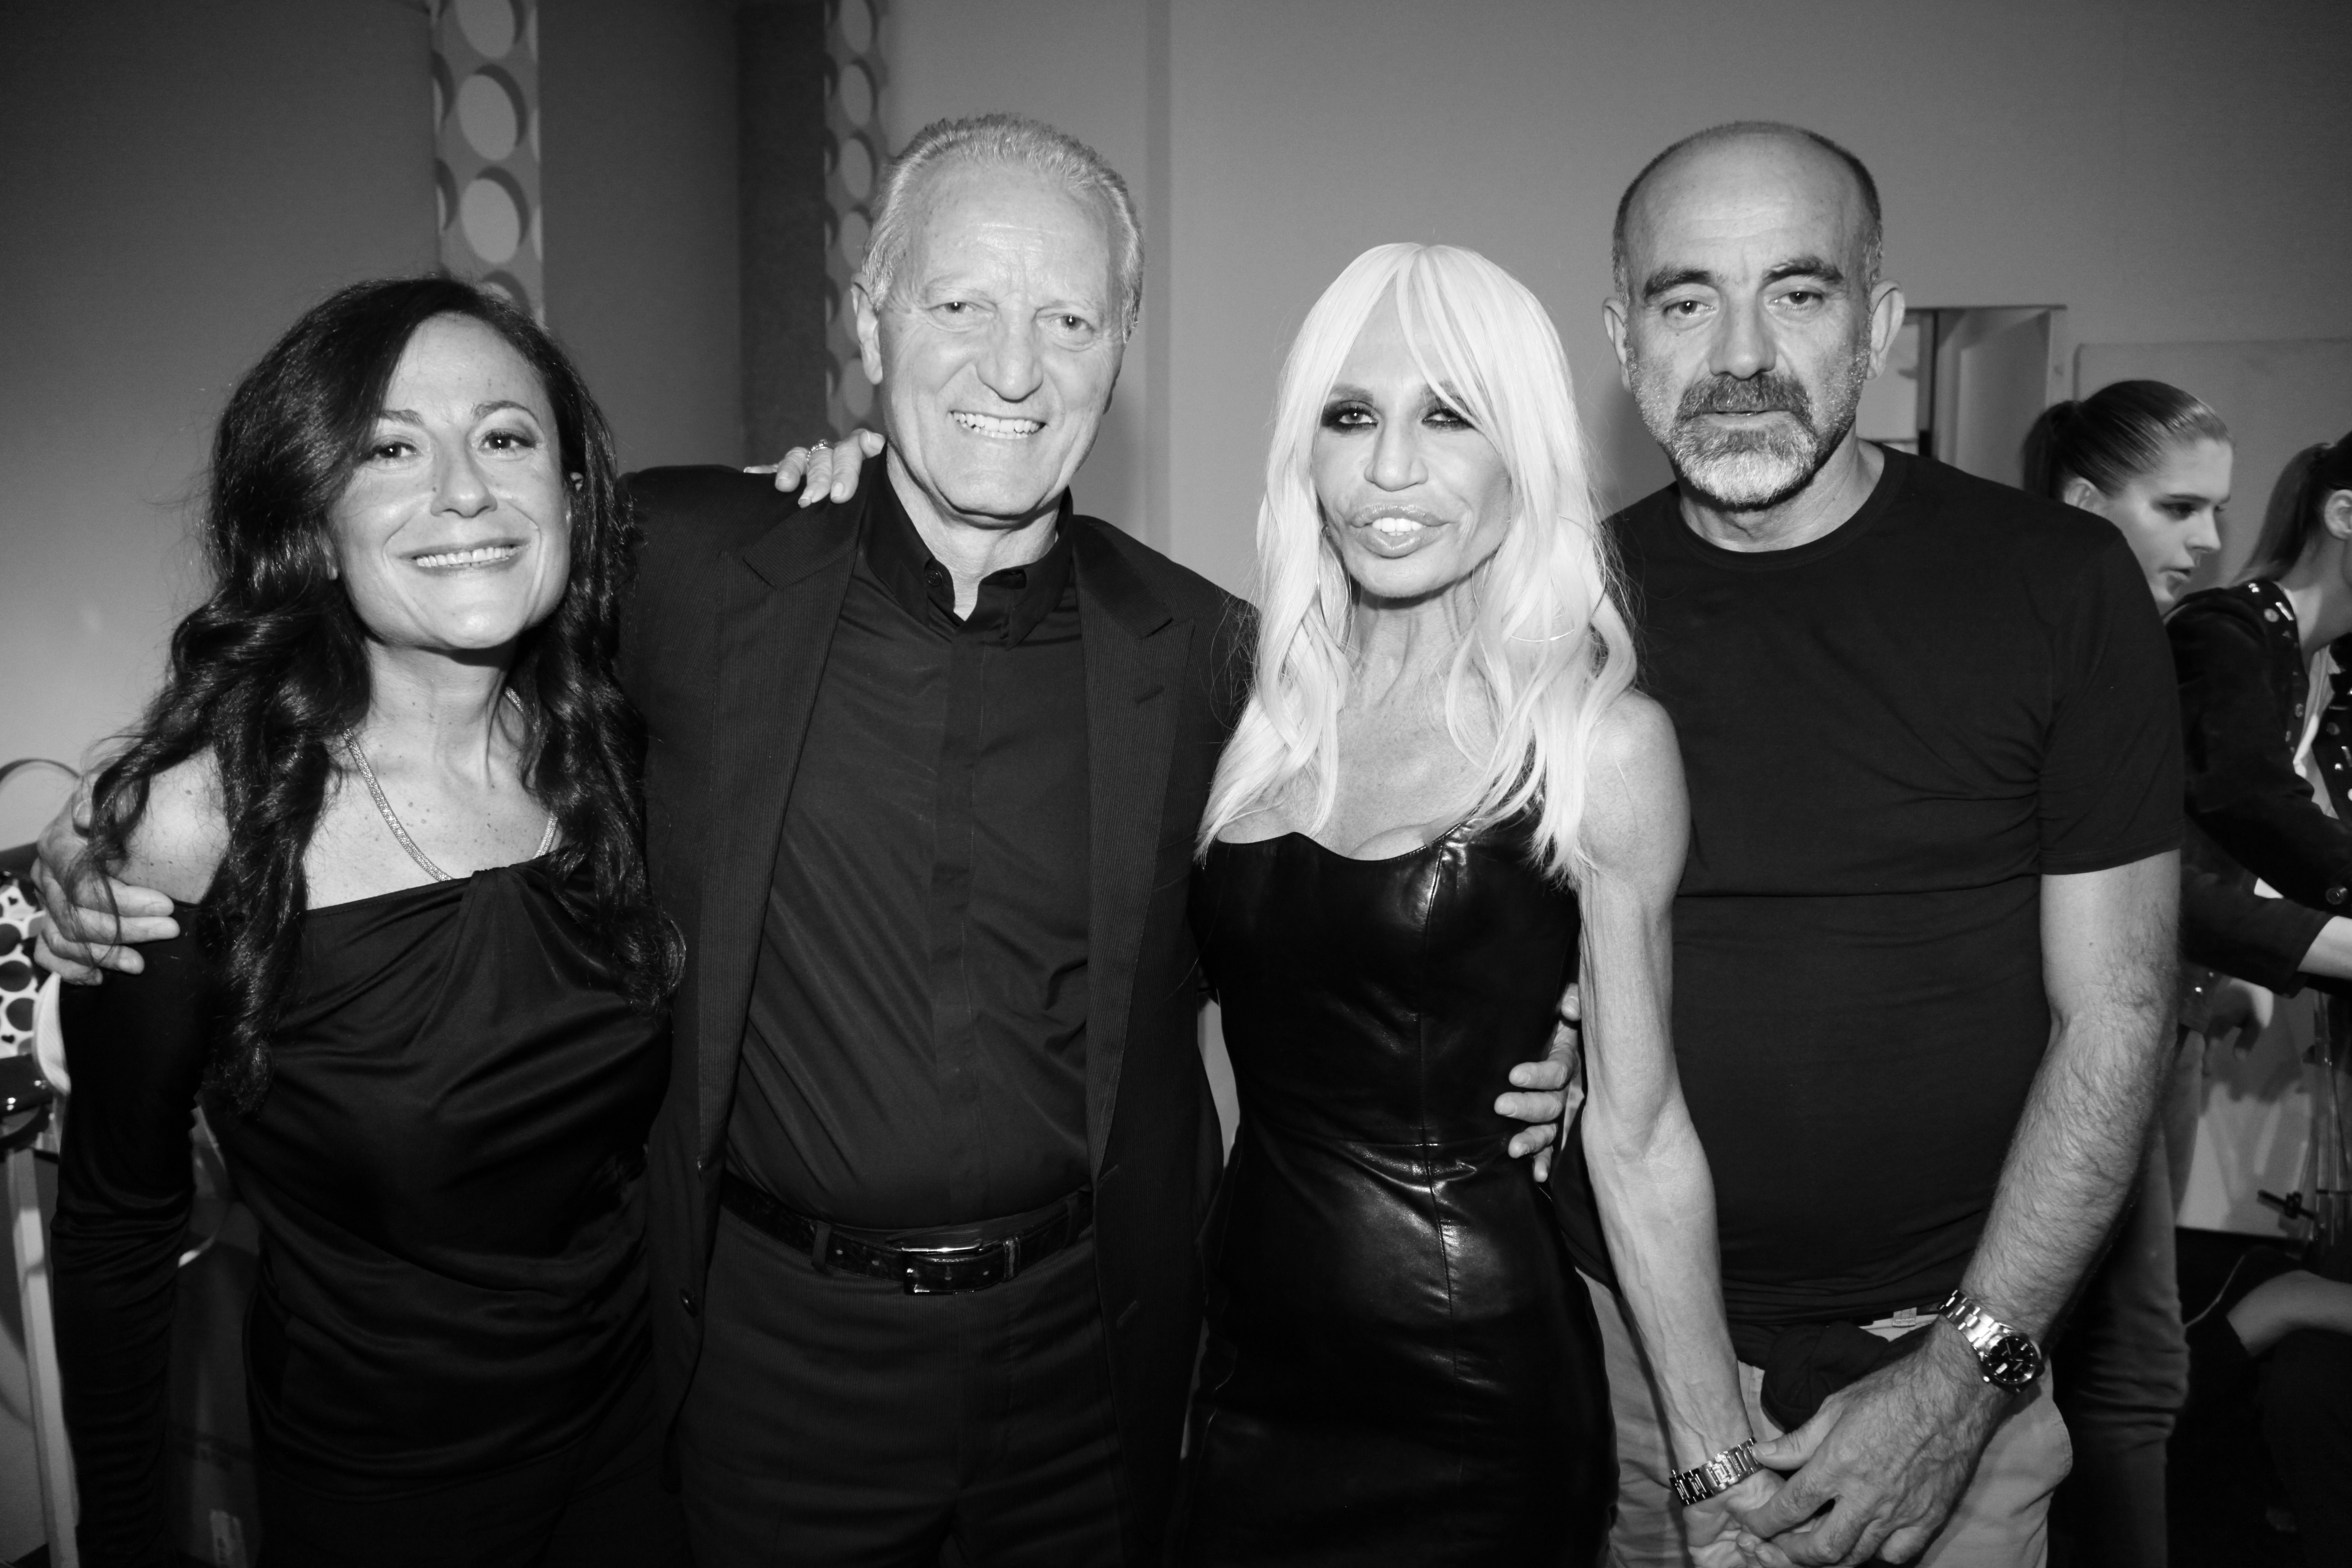 francesca versace, santo versace et Donatella Versace ...